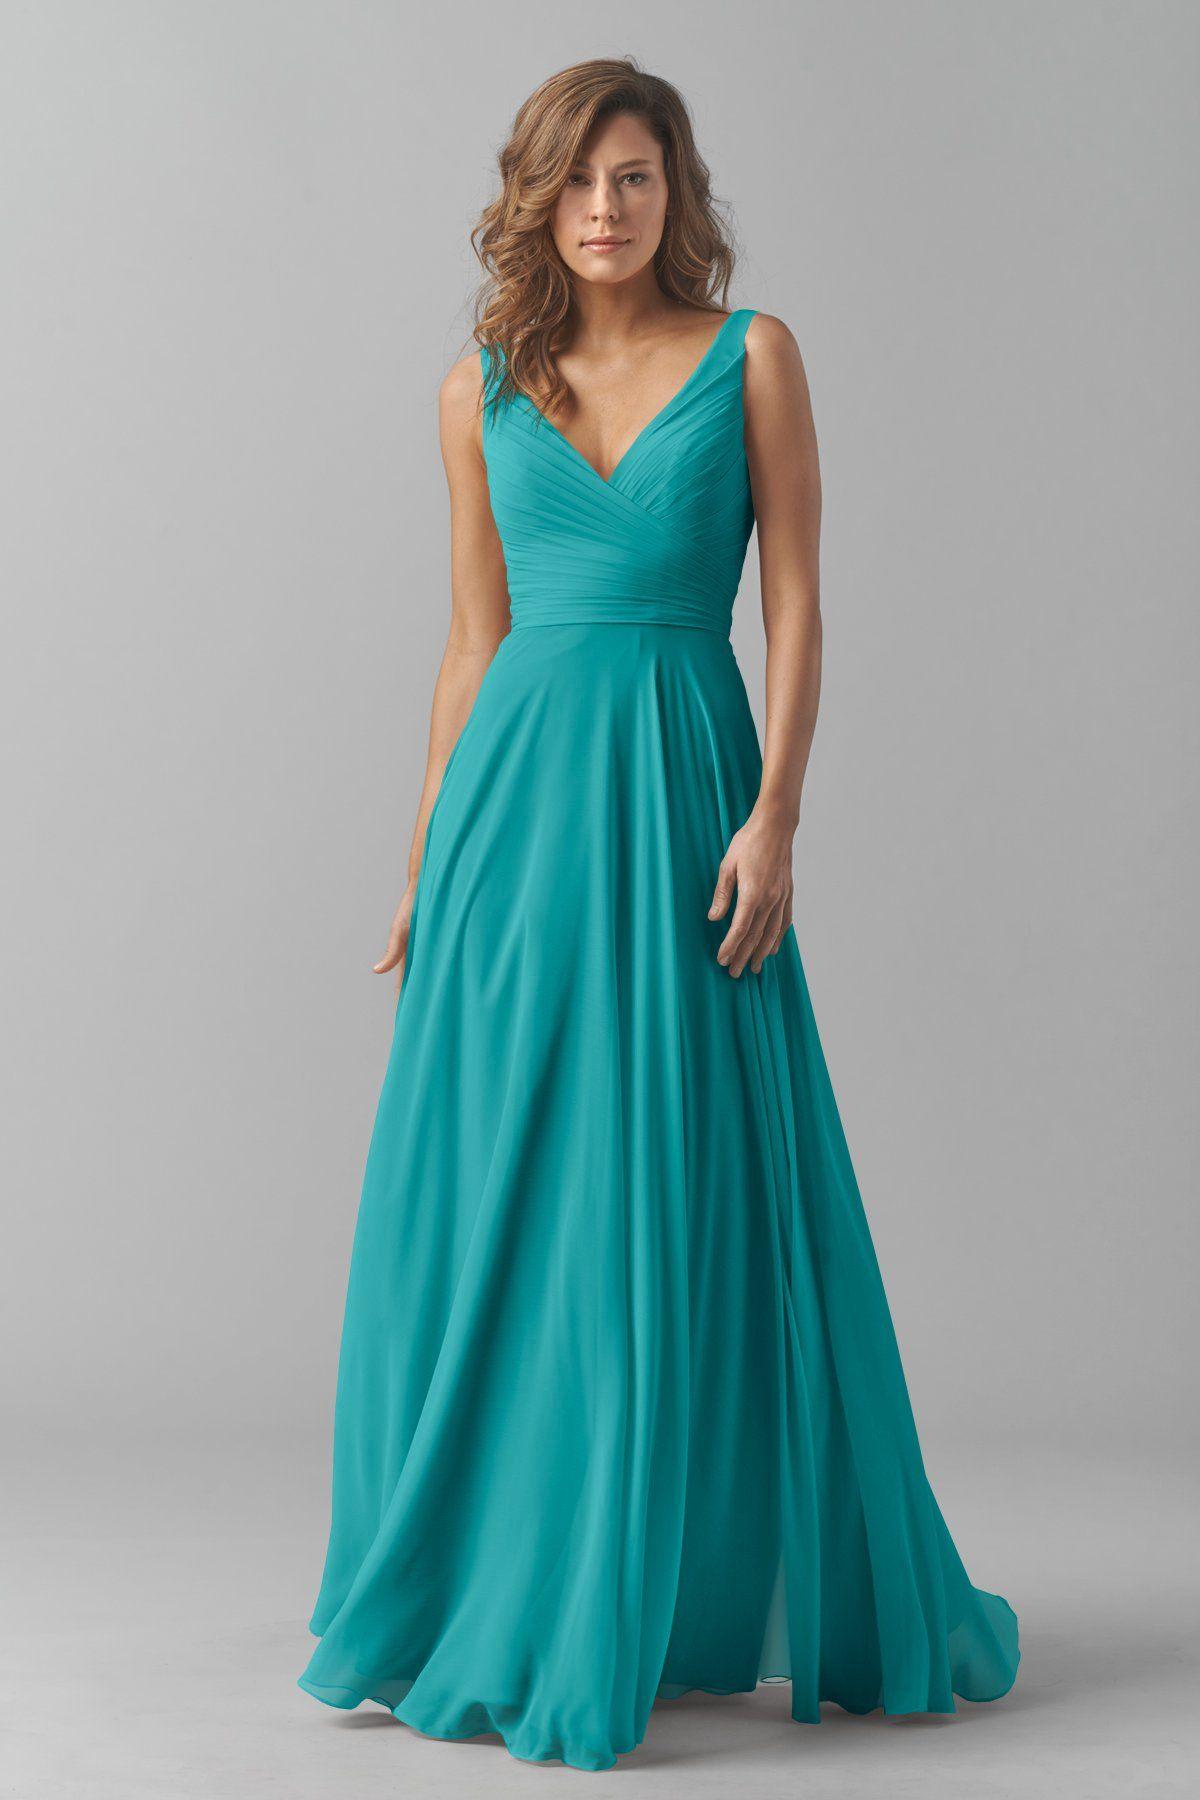 Karen 8542i | Bridesmaids | Watters | Wedding | Pinterest | Maids ...